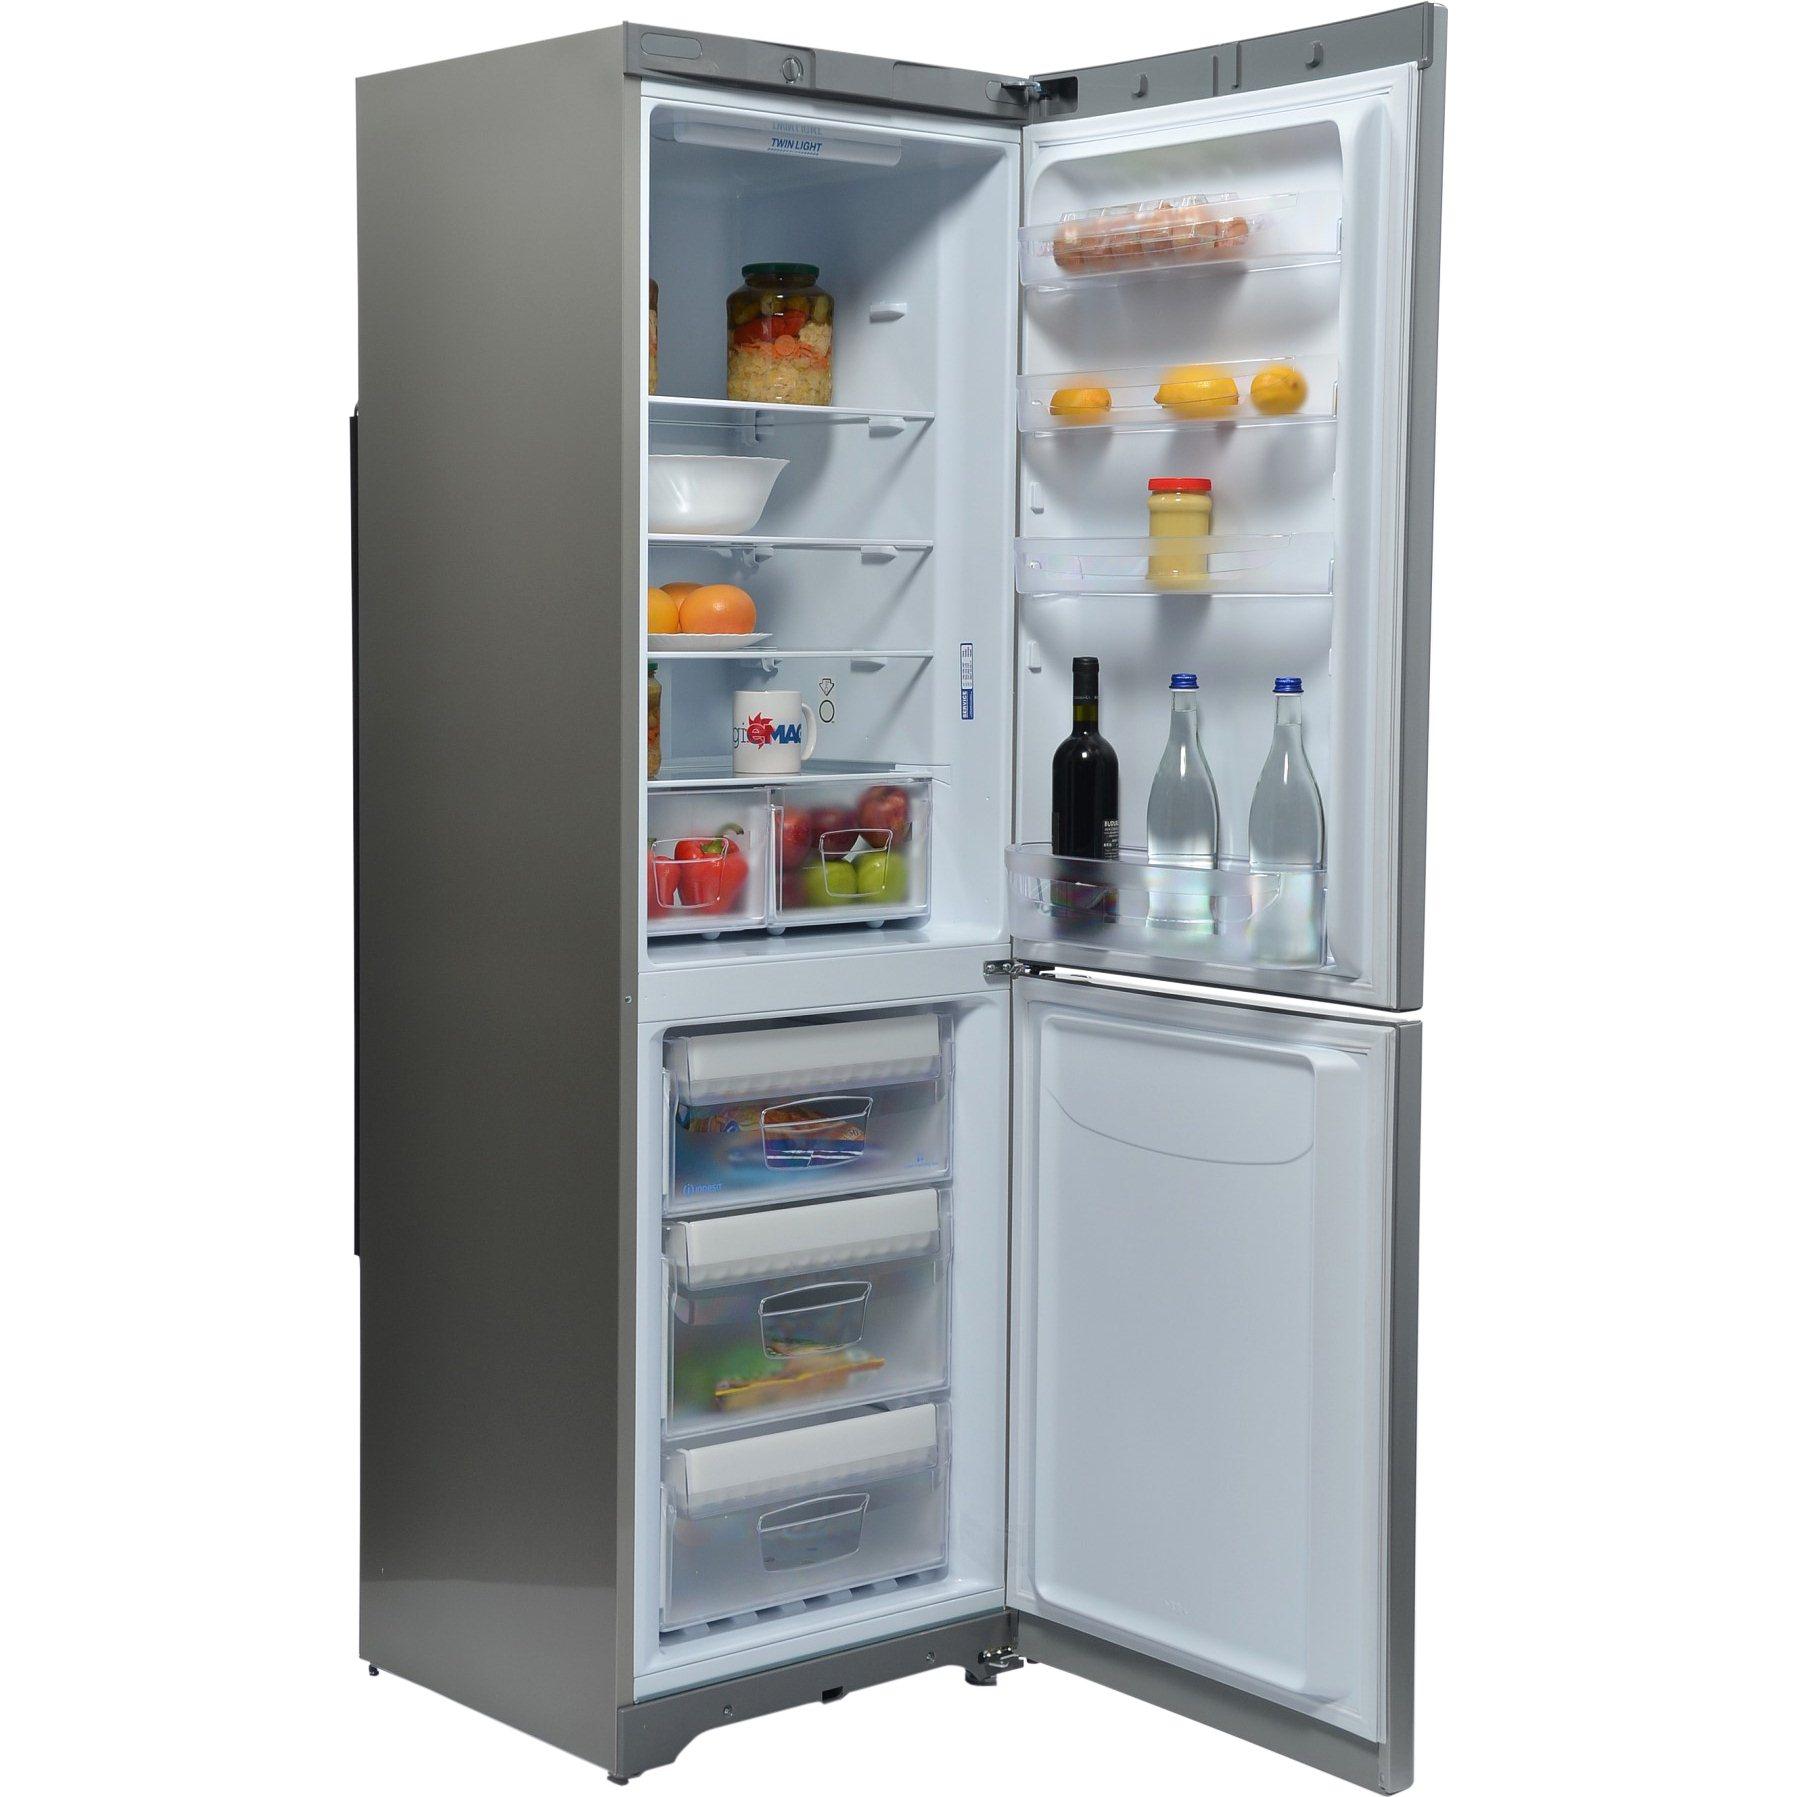 Noleggio frigoriferi per feste a milano cinefacility for Noleggio tendoni per feste udine